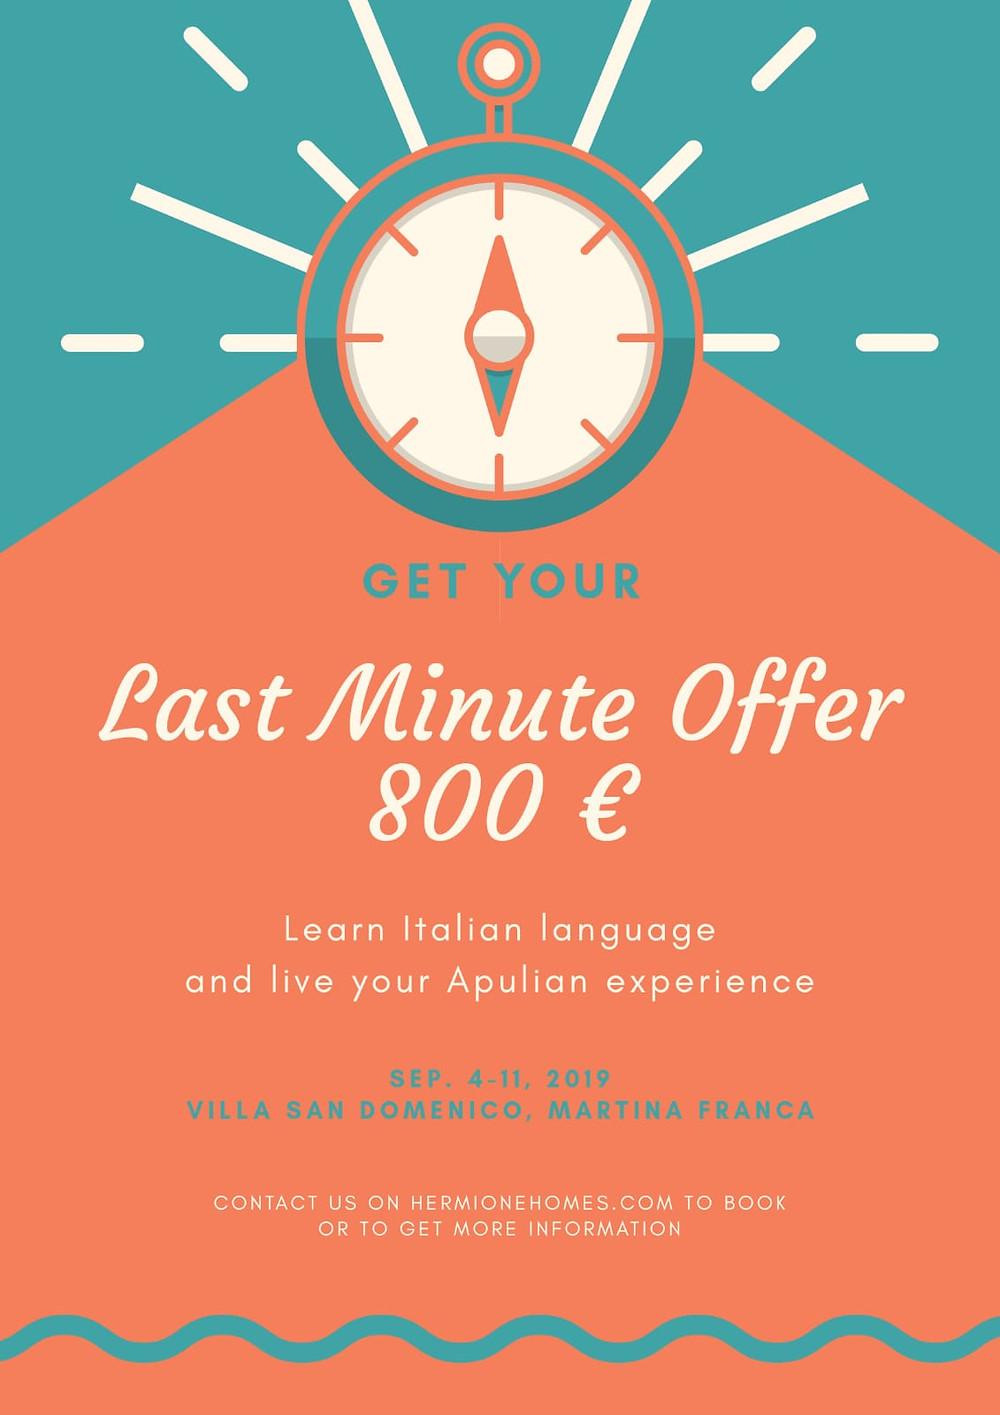 offer, last minute offer, Hermione Homes, R.italy, Roberta Capotondi, italian, italian teaching, italian course